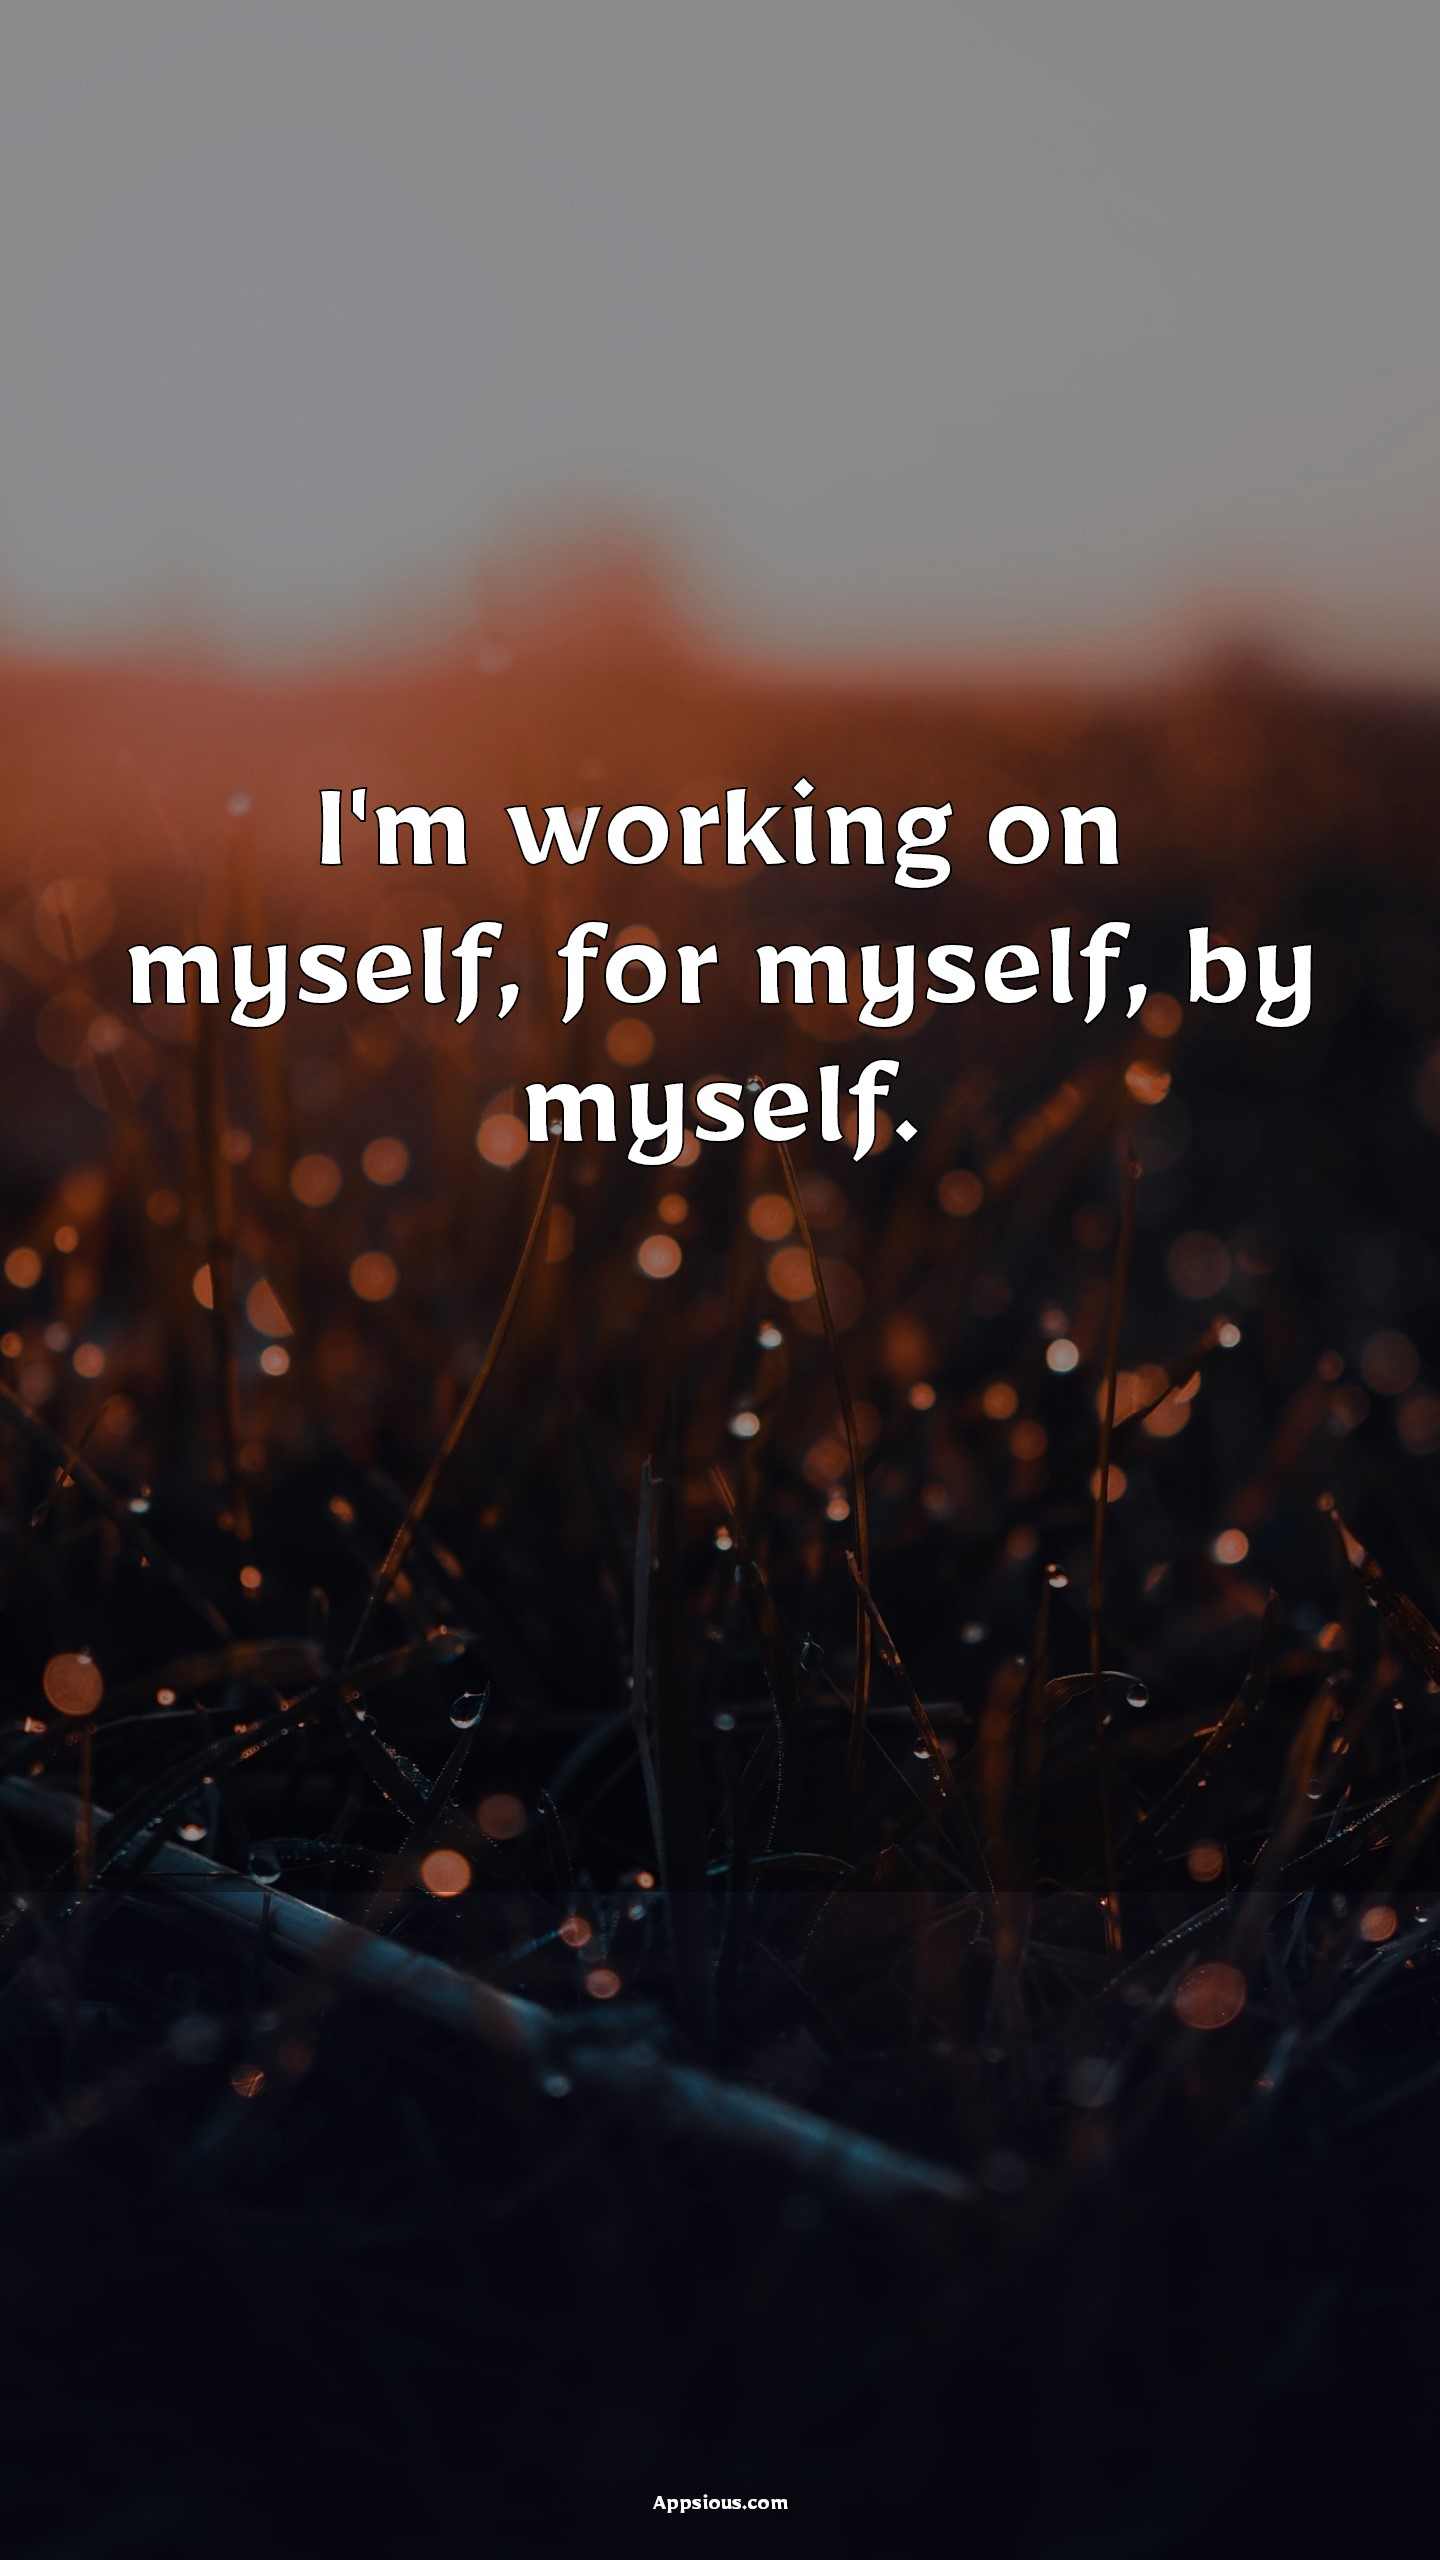 I'm working on myself, for myself, by myself.